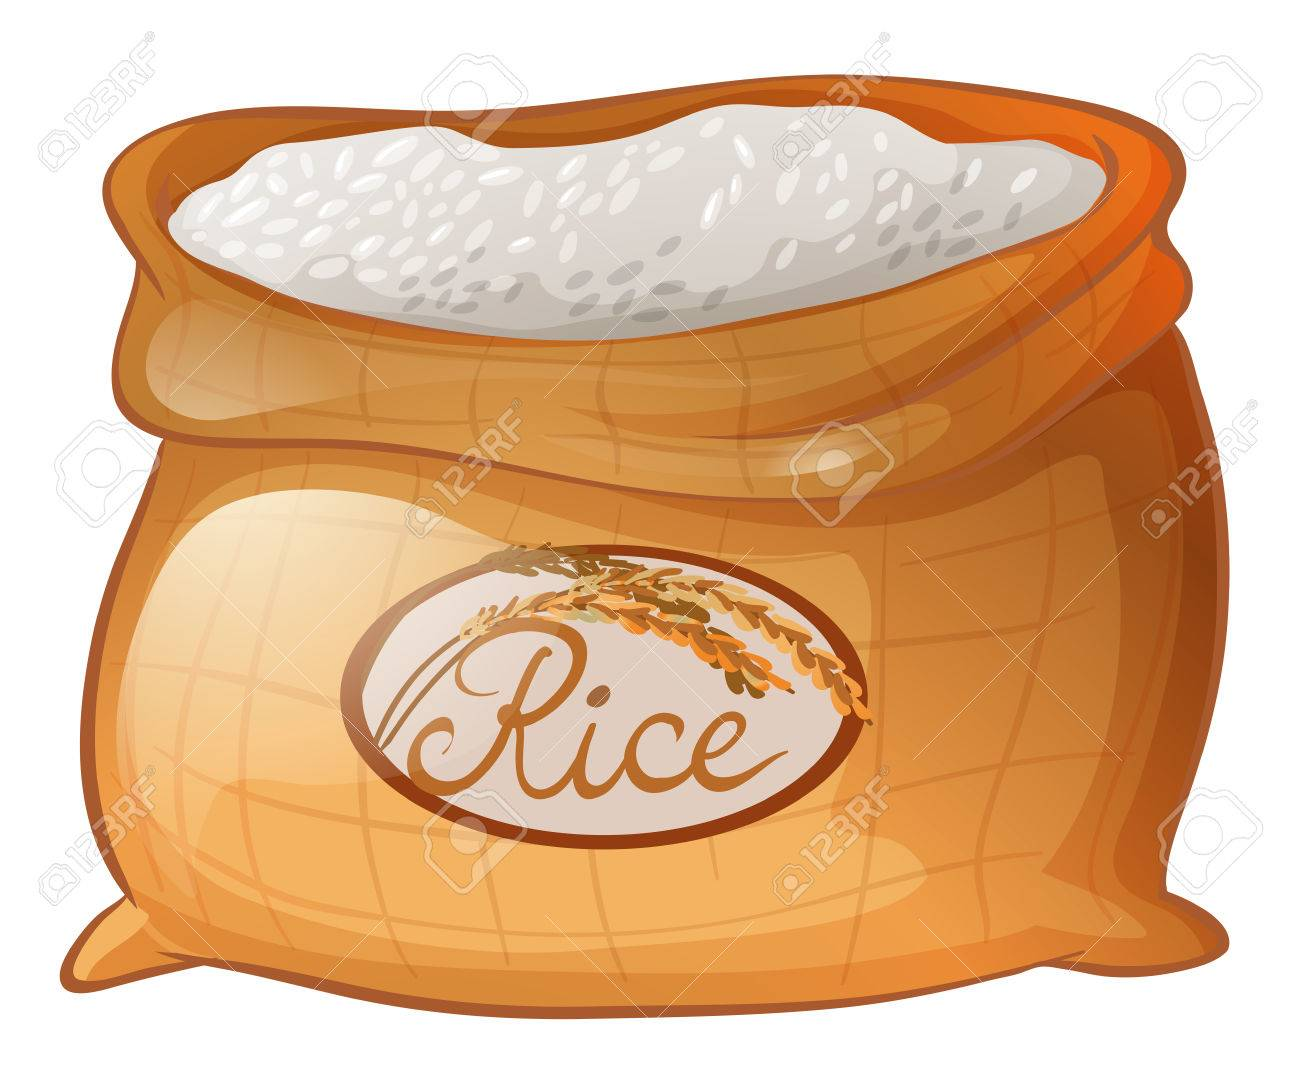 Bag of rice on white background illustration.